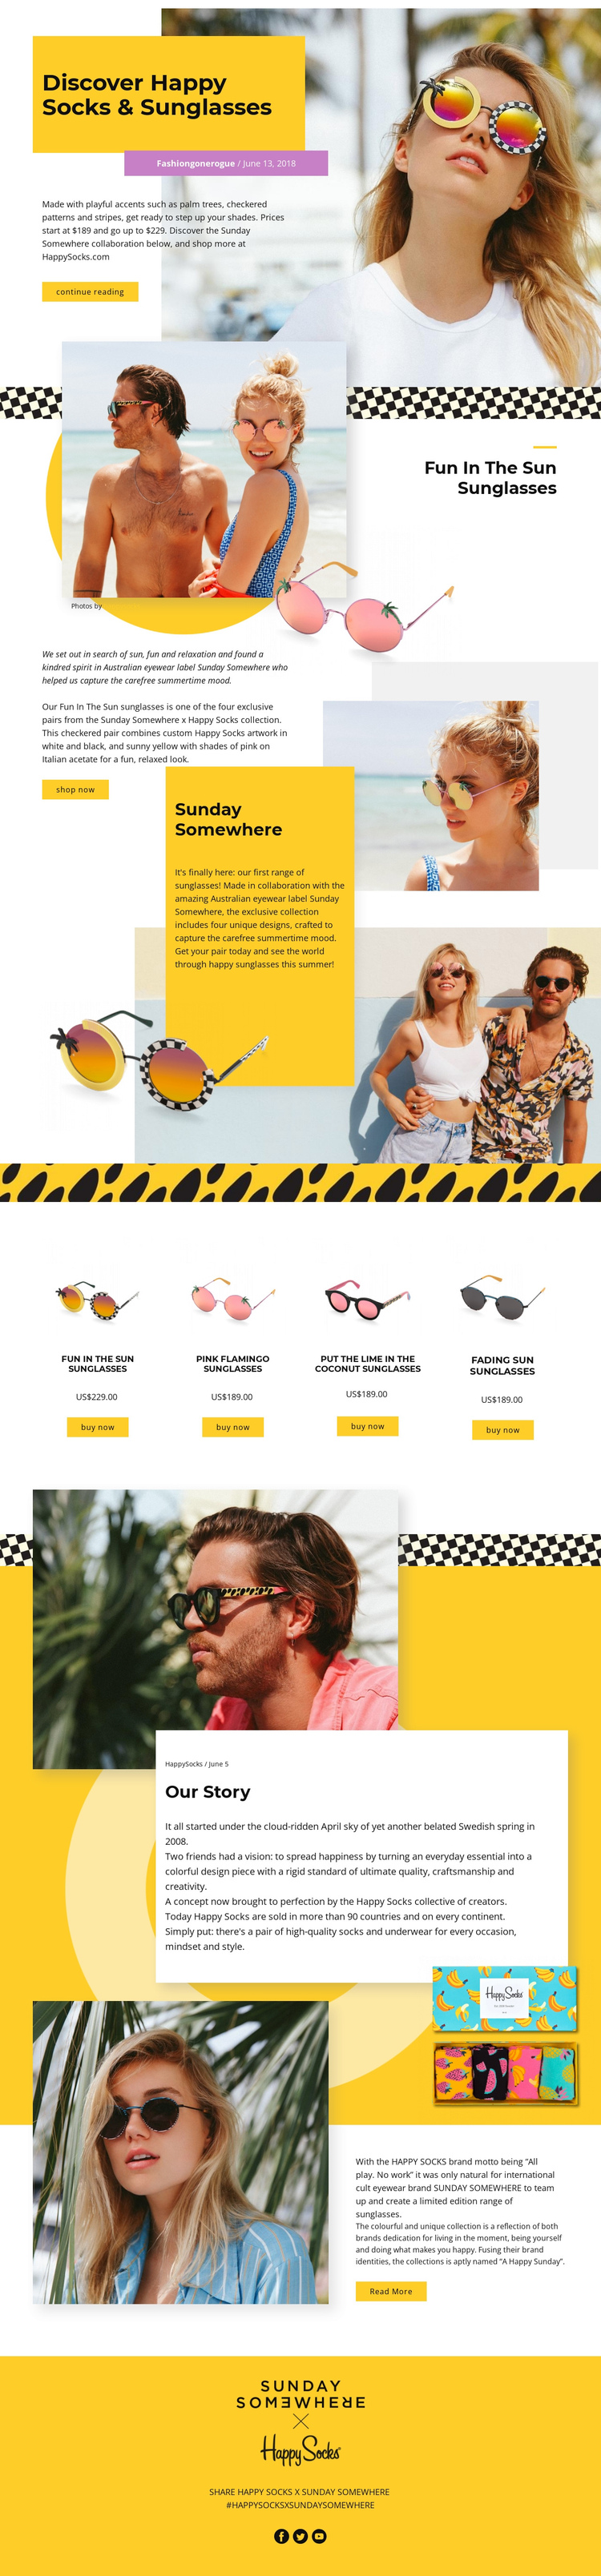 Sunglasses Website Builder Software